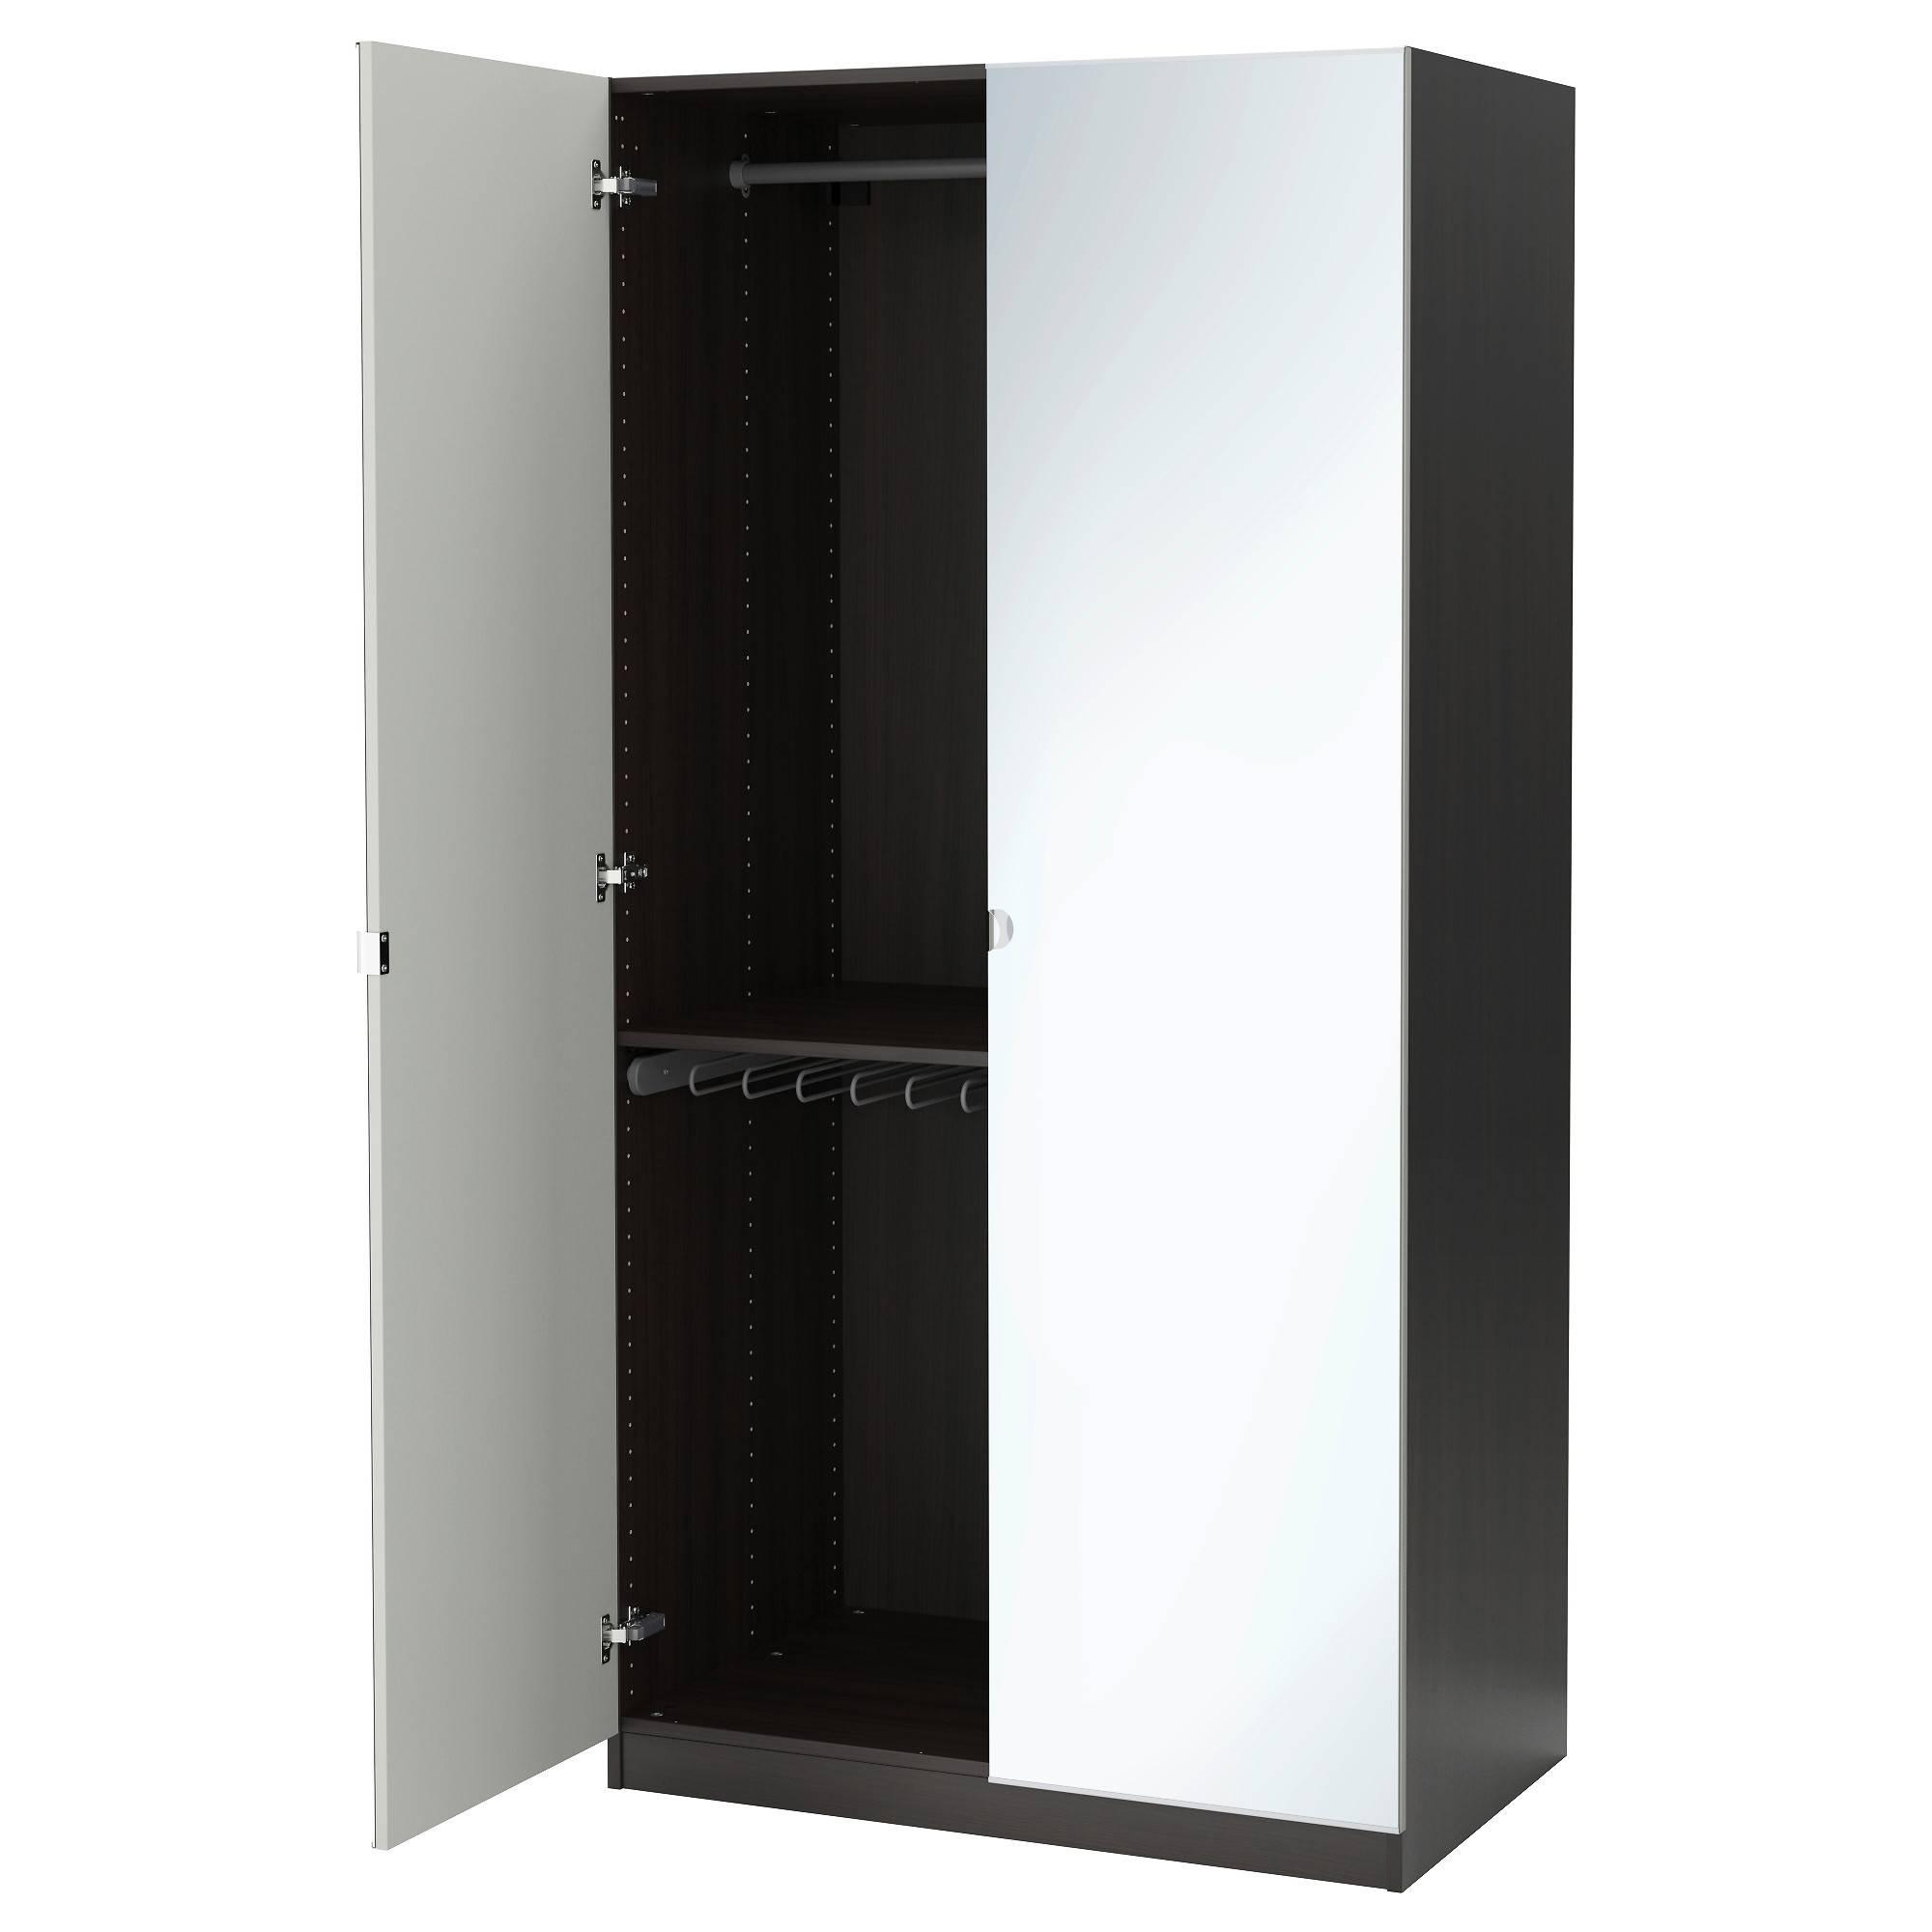 Pax Wardrobe Black-Brown/vikedal Mirror Glass 100X60X201 Cm - Ikea pertaining to Single Wardrobes With Mirror (Image 6 of 15)